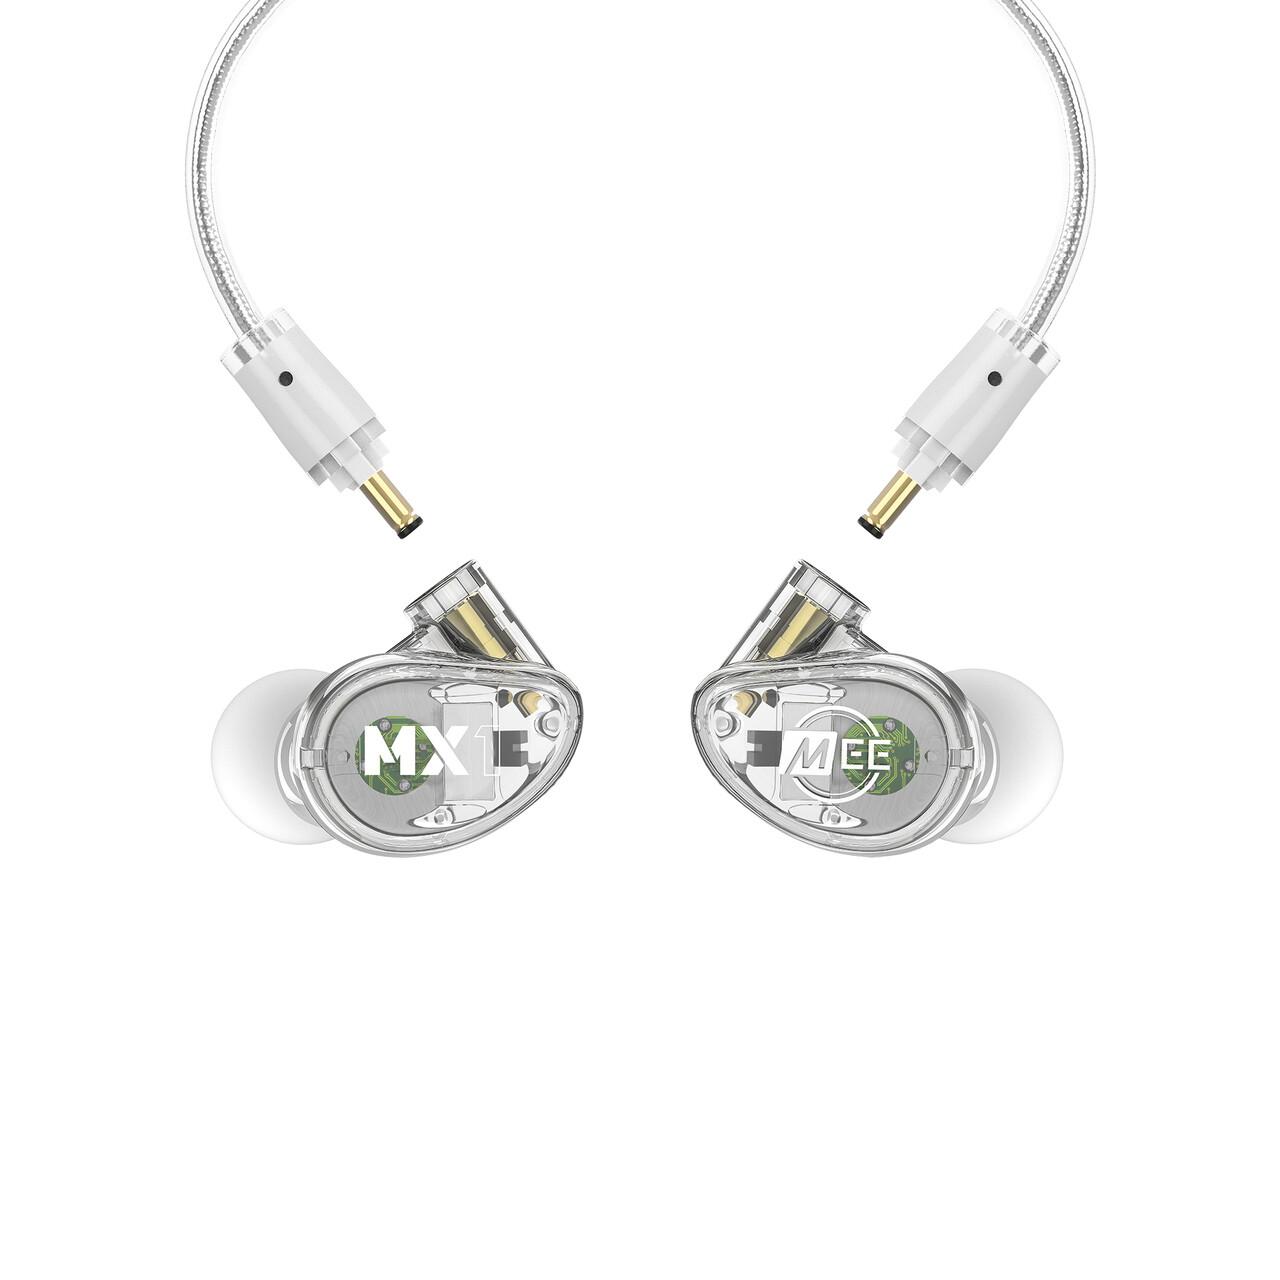 Mee Audio MX-PRO MX3 In-Ear Monitors